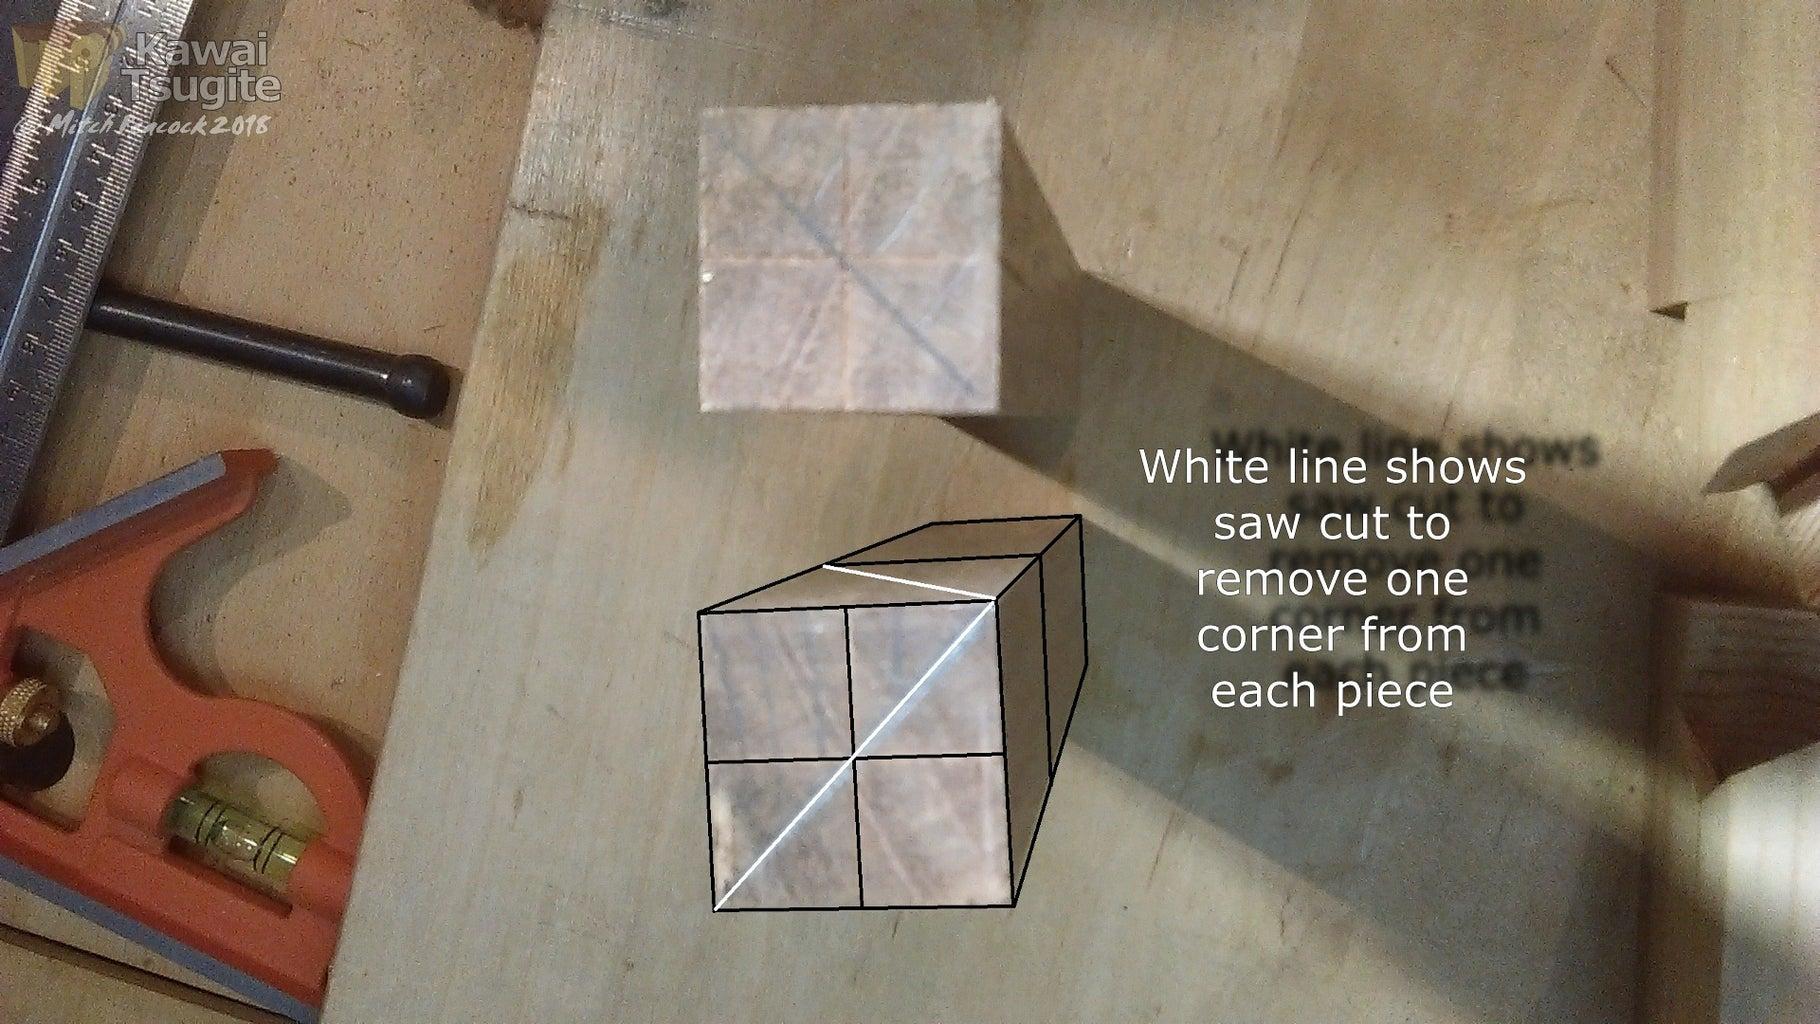 Removing the Corner